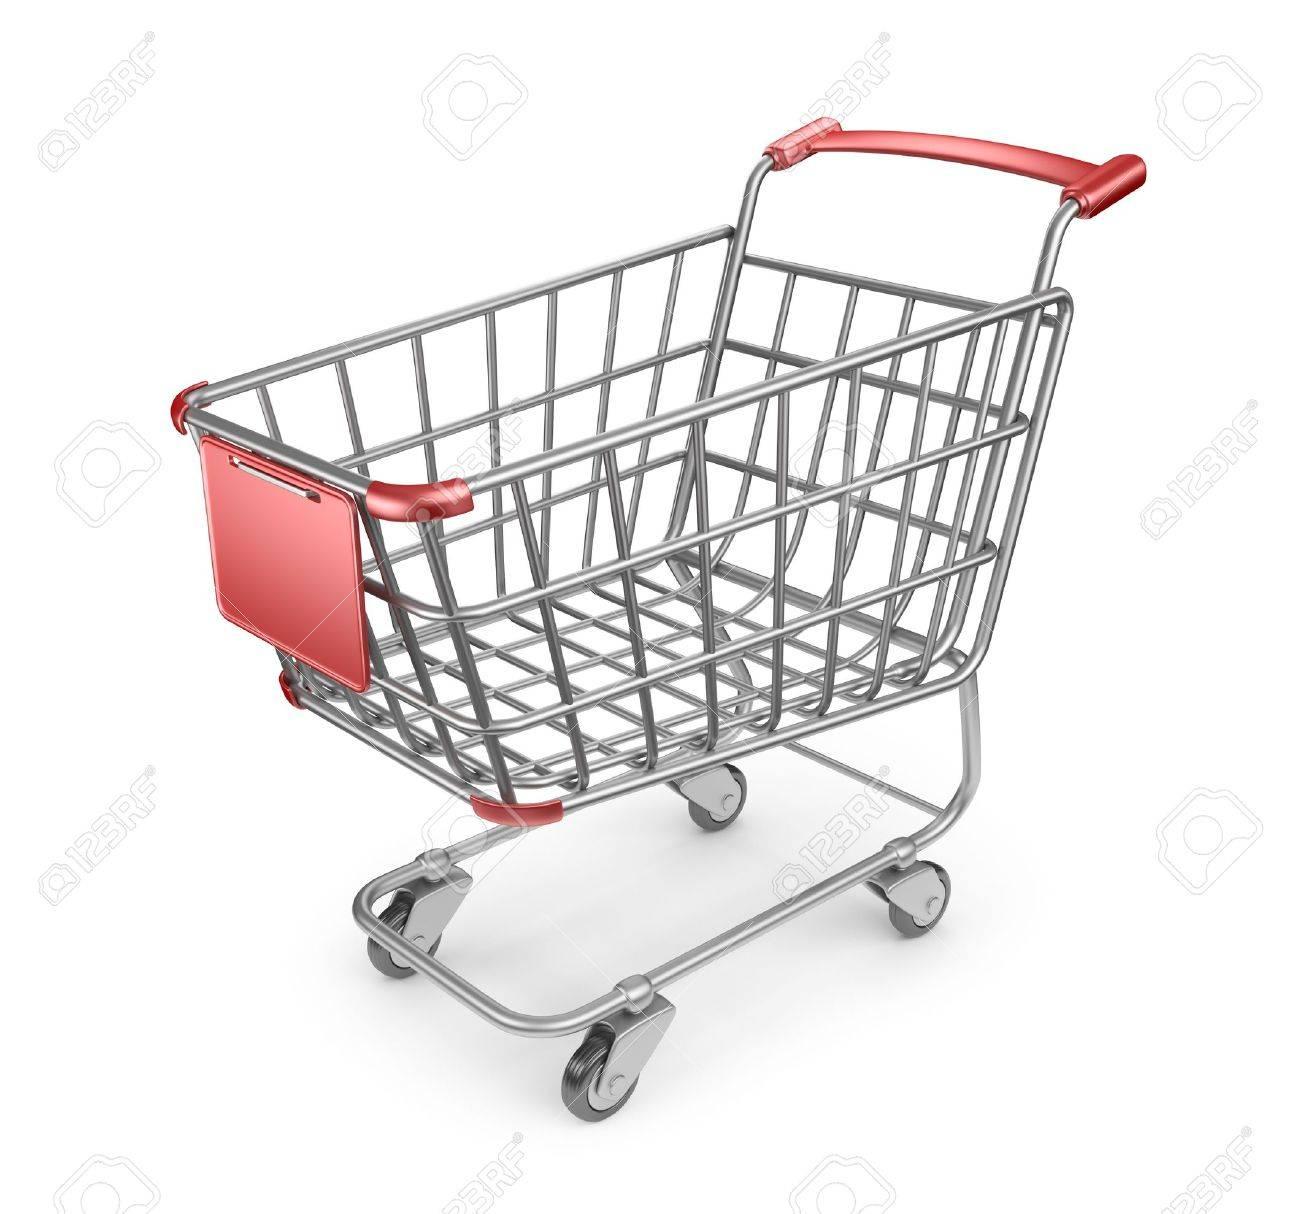 Market shopping cart 3D. Isolated on white background - 19054561